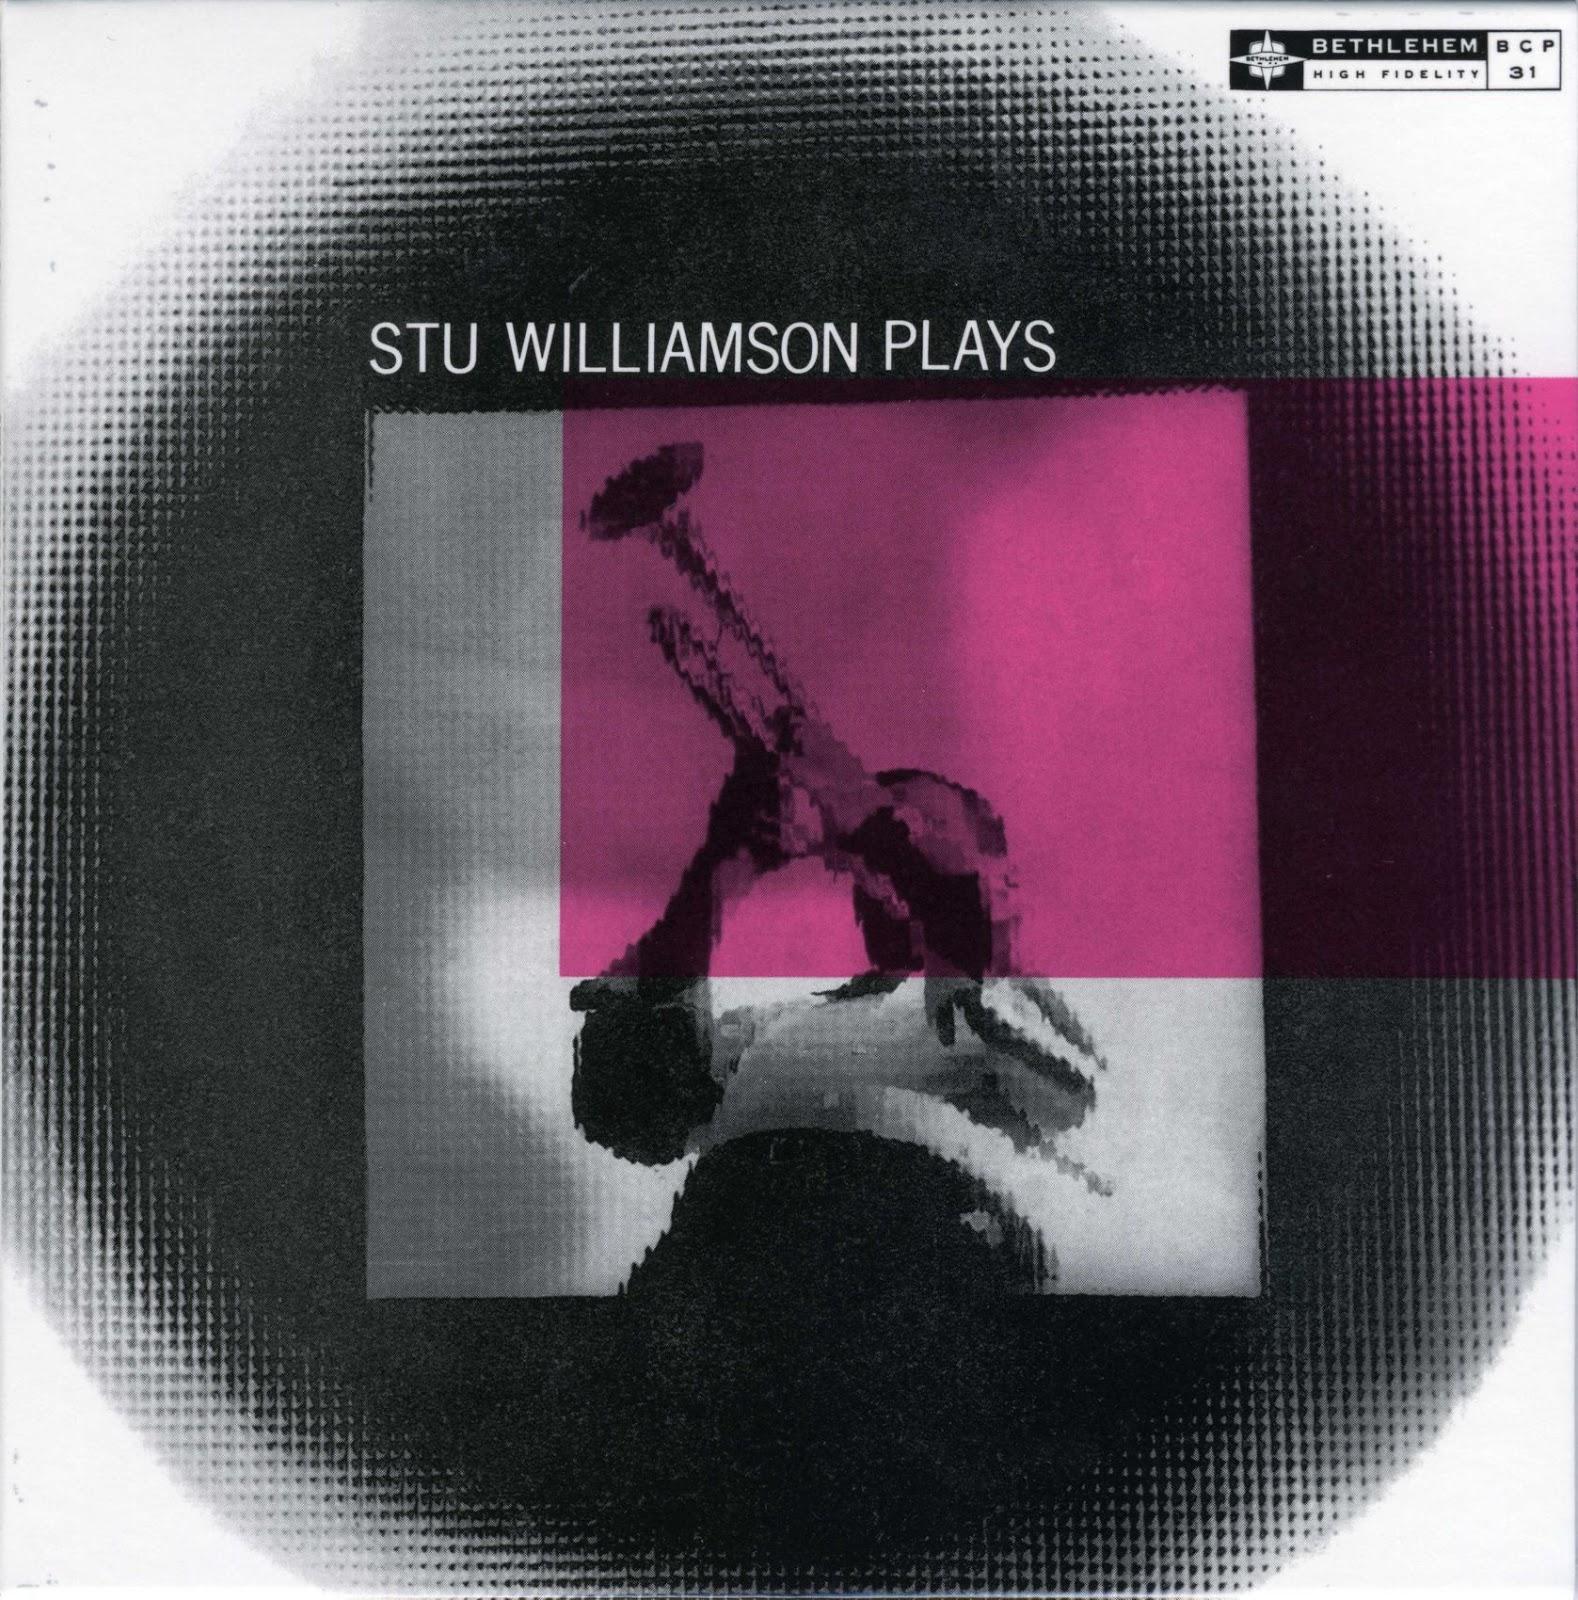 Stu Williamson net worth